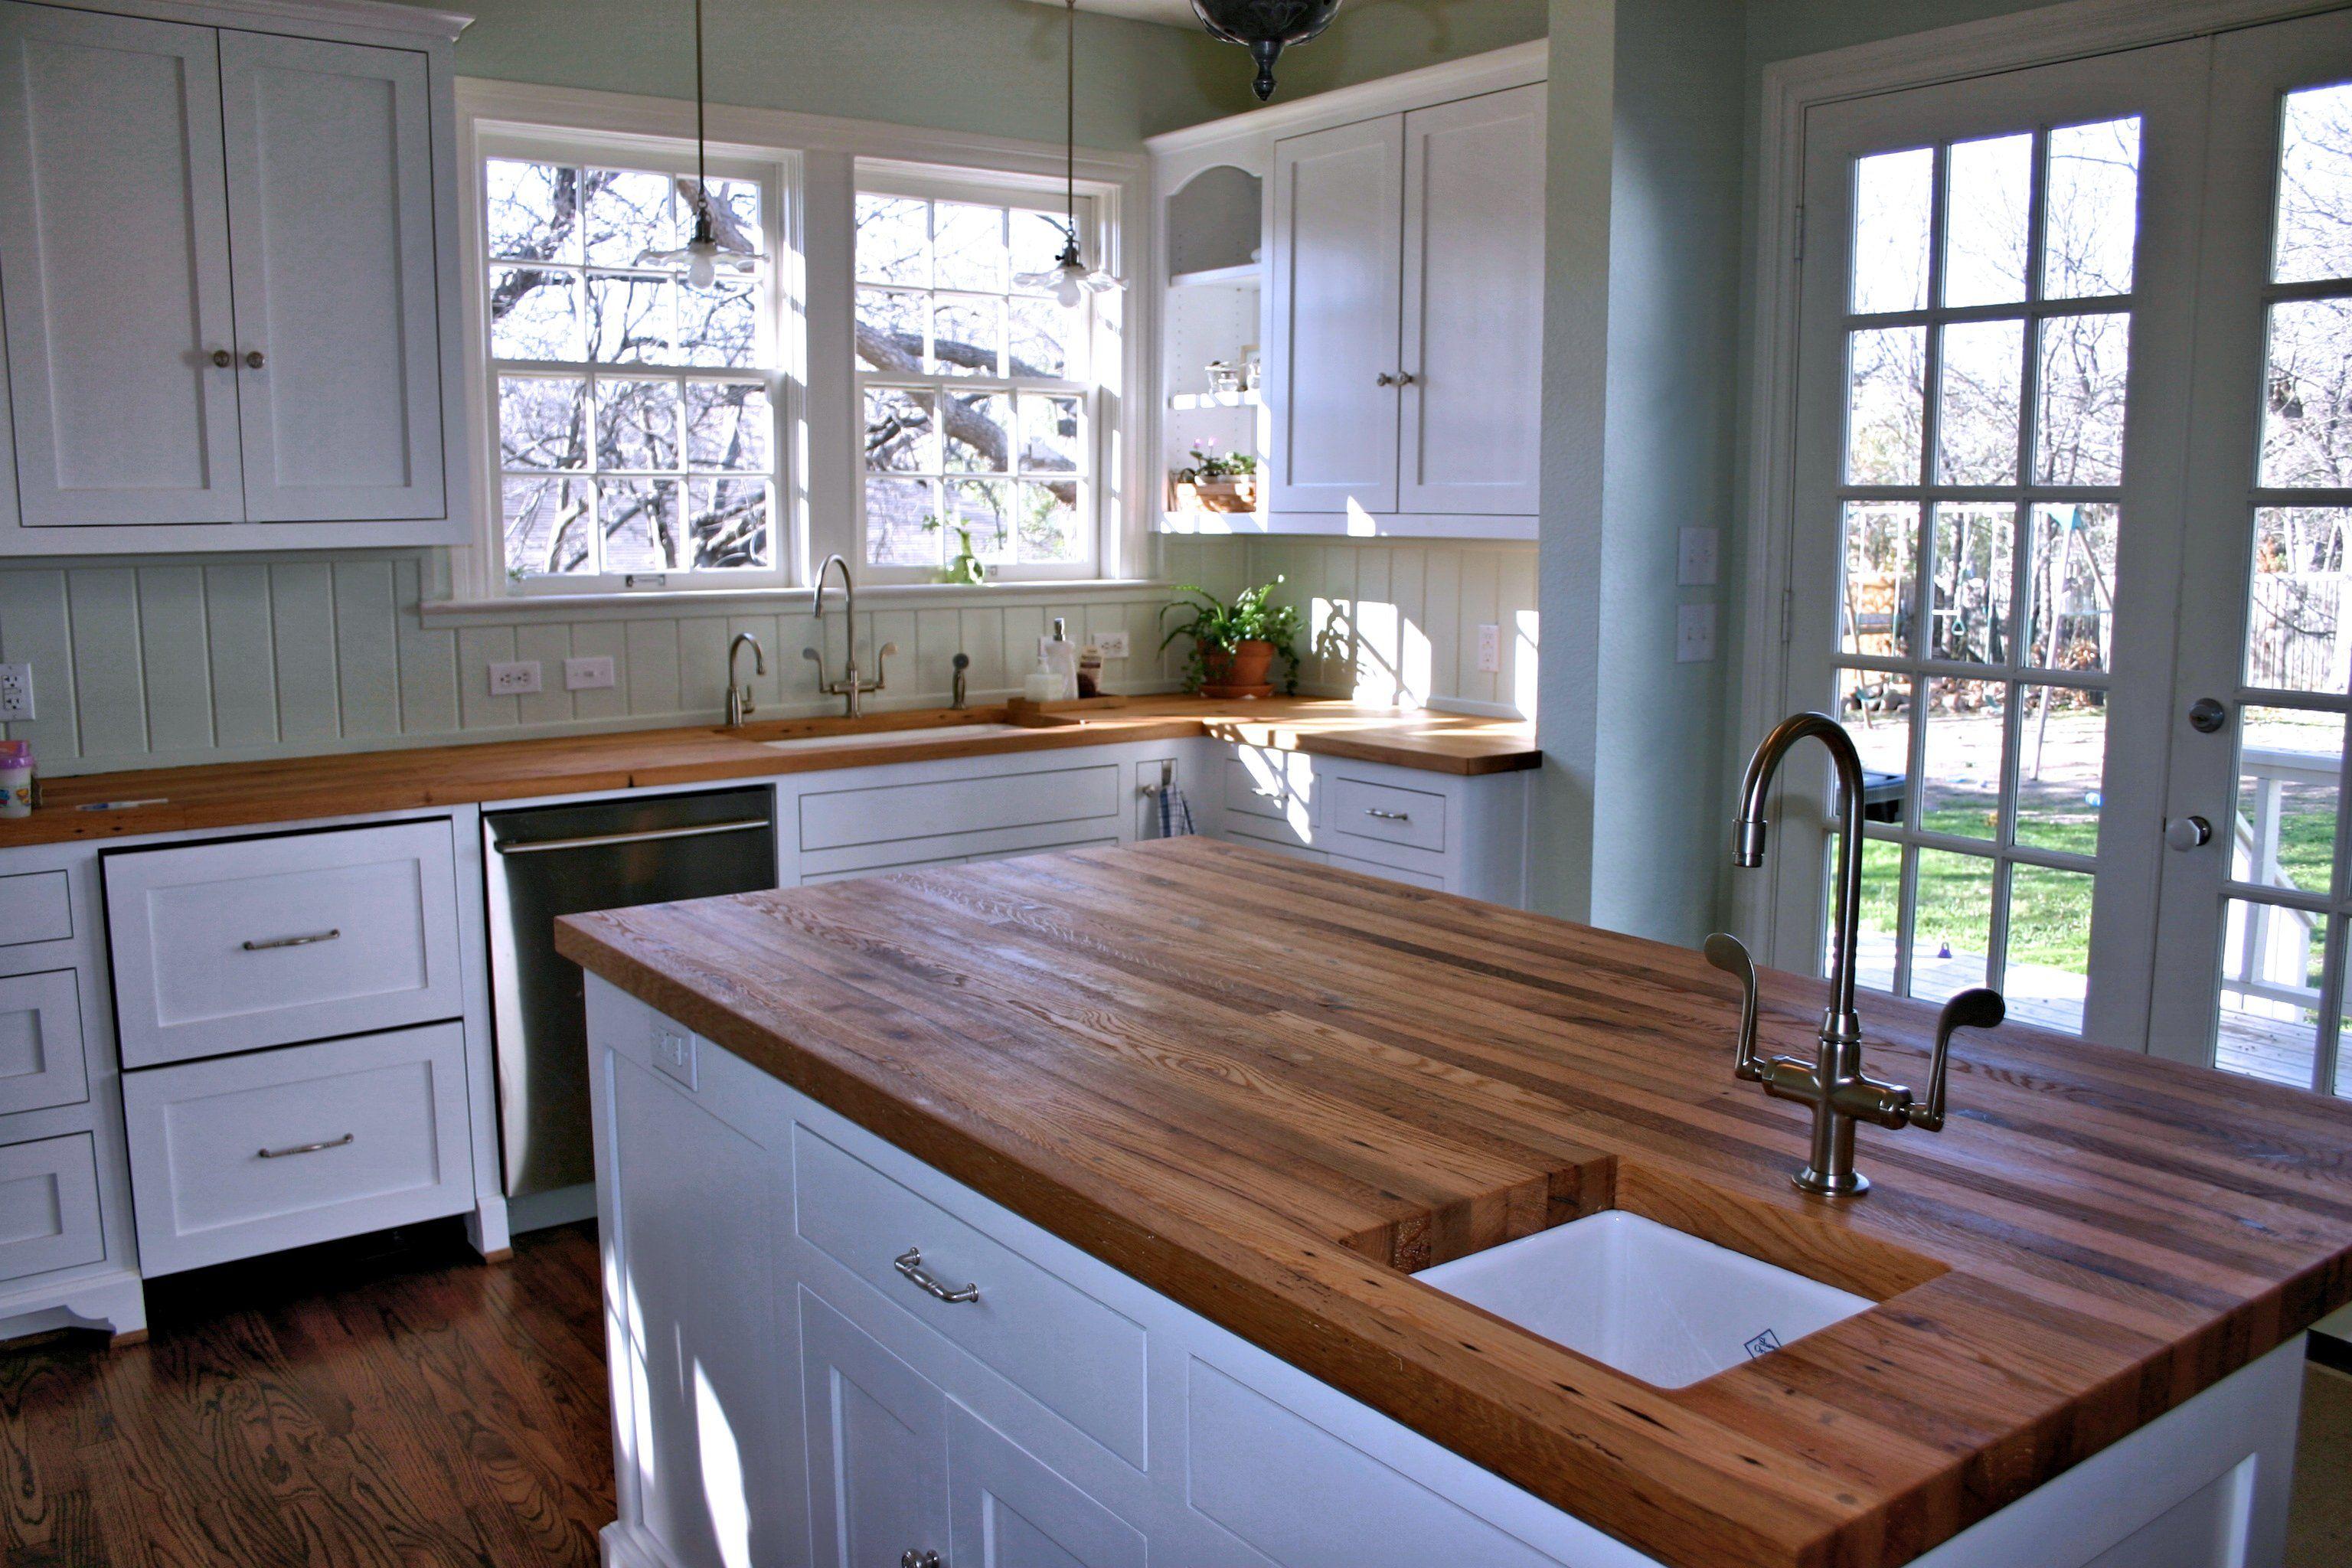 reclaimed white oak wood countertop photos wood countertops kitchen Reclaimed White Oak face grain custom wood island countertop and countertop